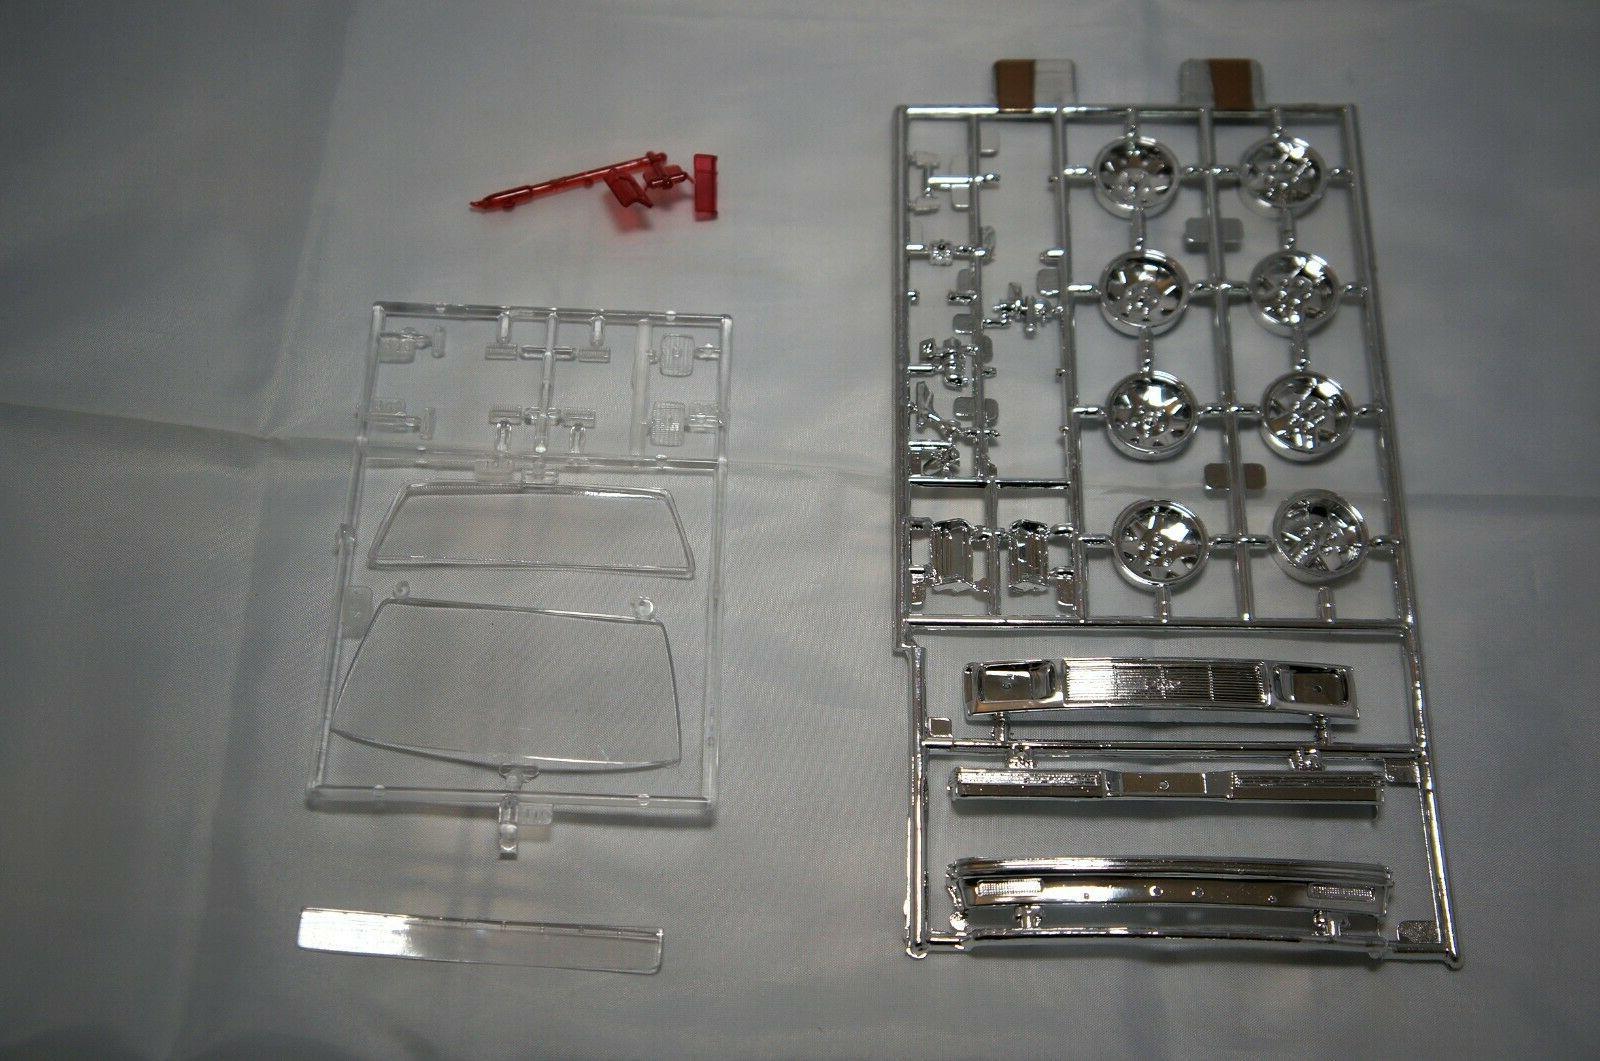 Lindberg GMC Sonoma Racer 1/20 Scale Plastic Model